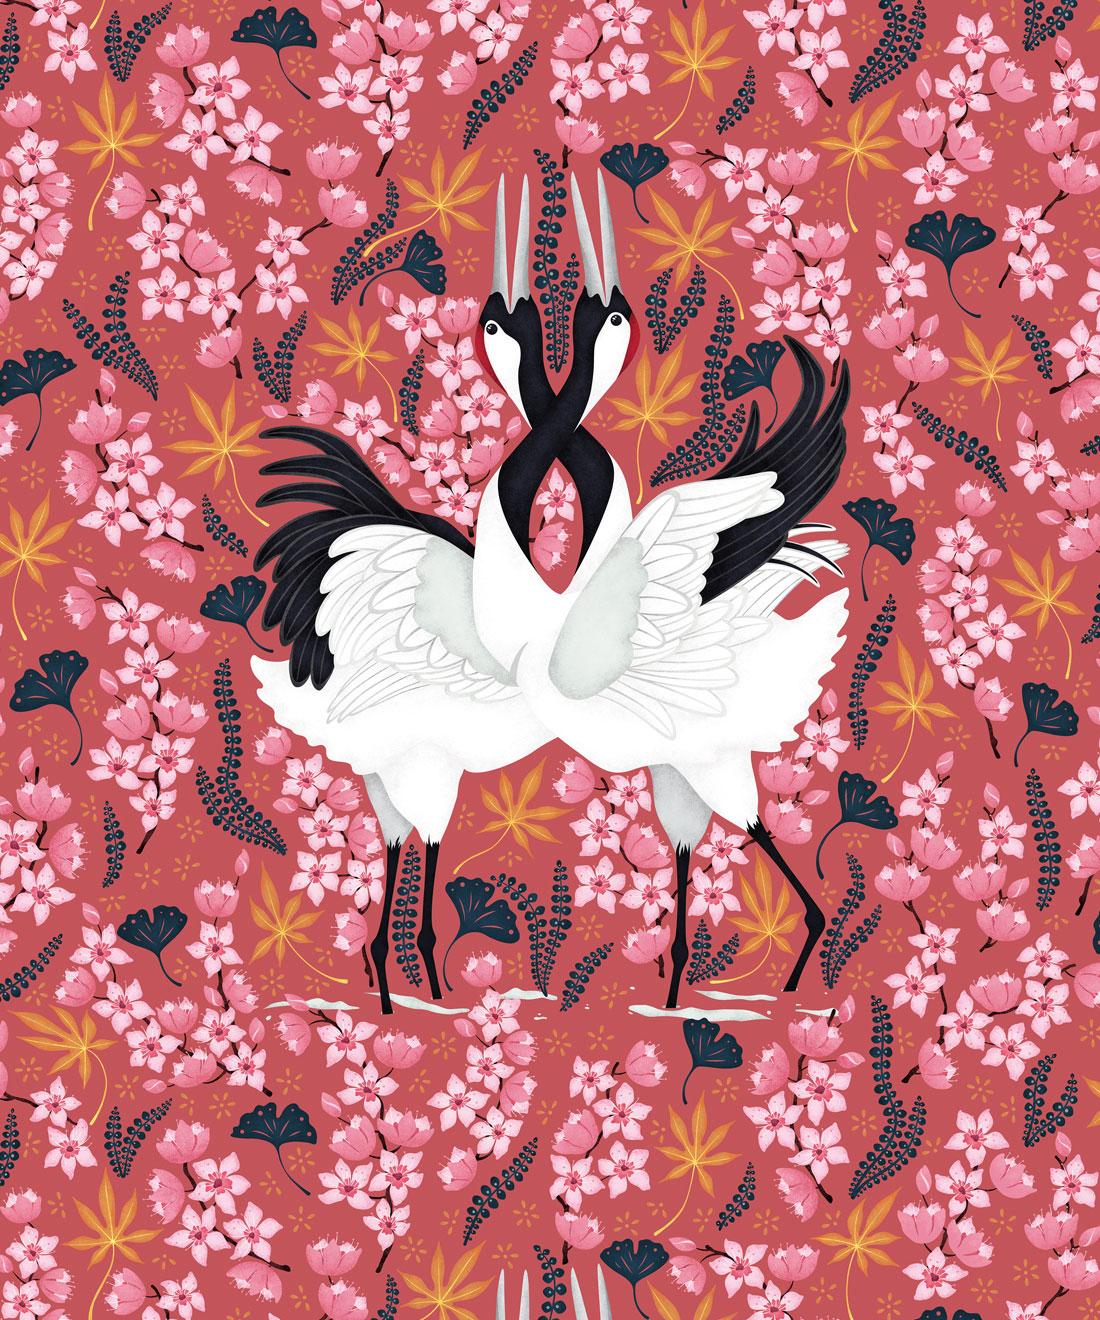 Japanese Cranes Wallpaper Bold Bird Wallpaper Milton King Australia